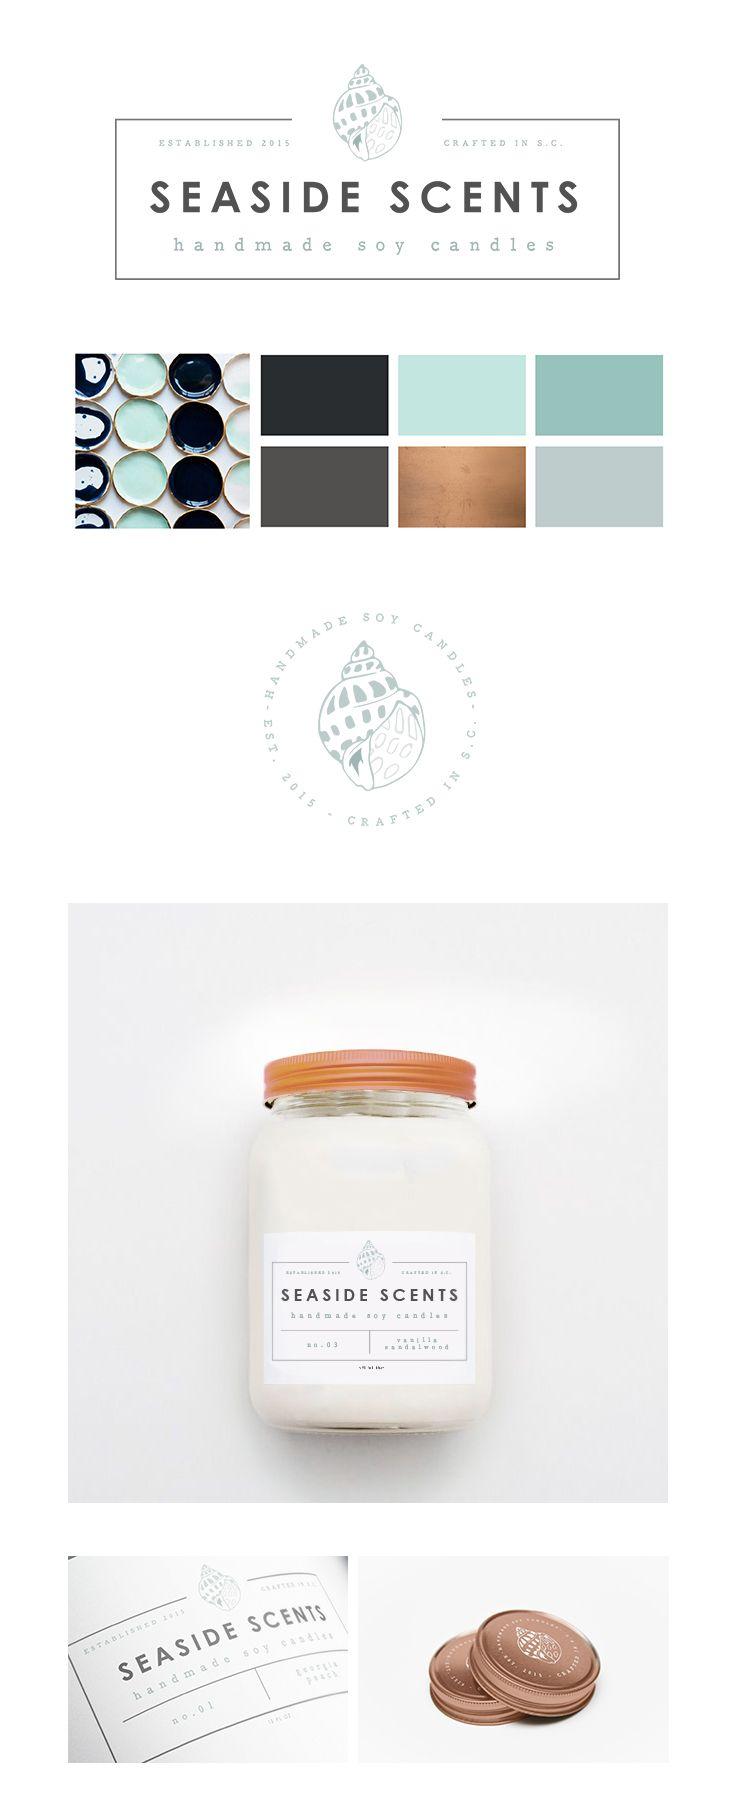 Seaside Scents | Modern Candle Label Design | Brand Identity Pack | MVAZ Design | www.mvazdesign.com